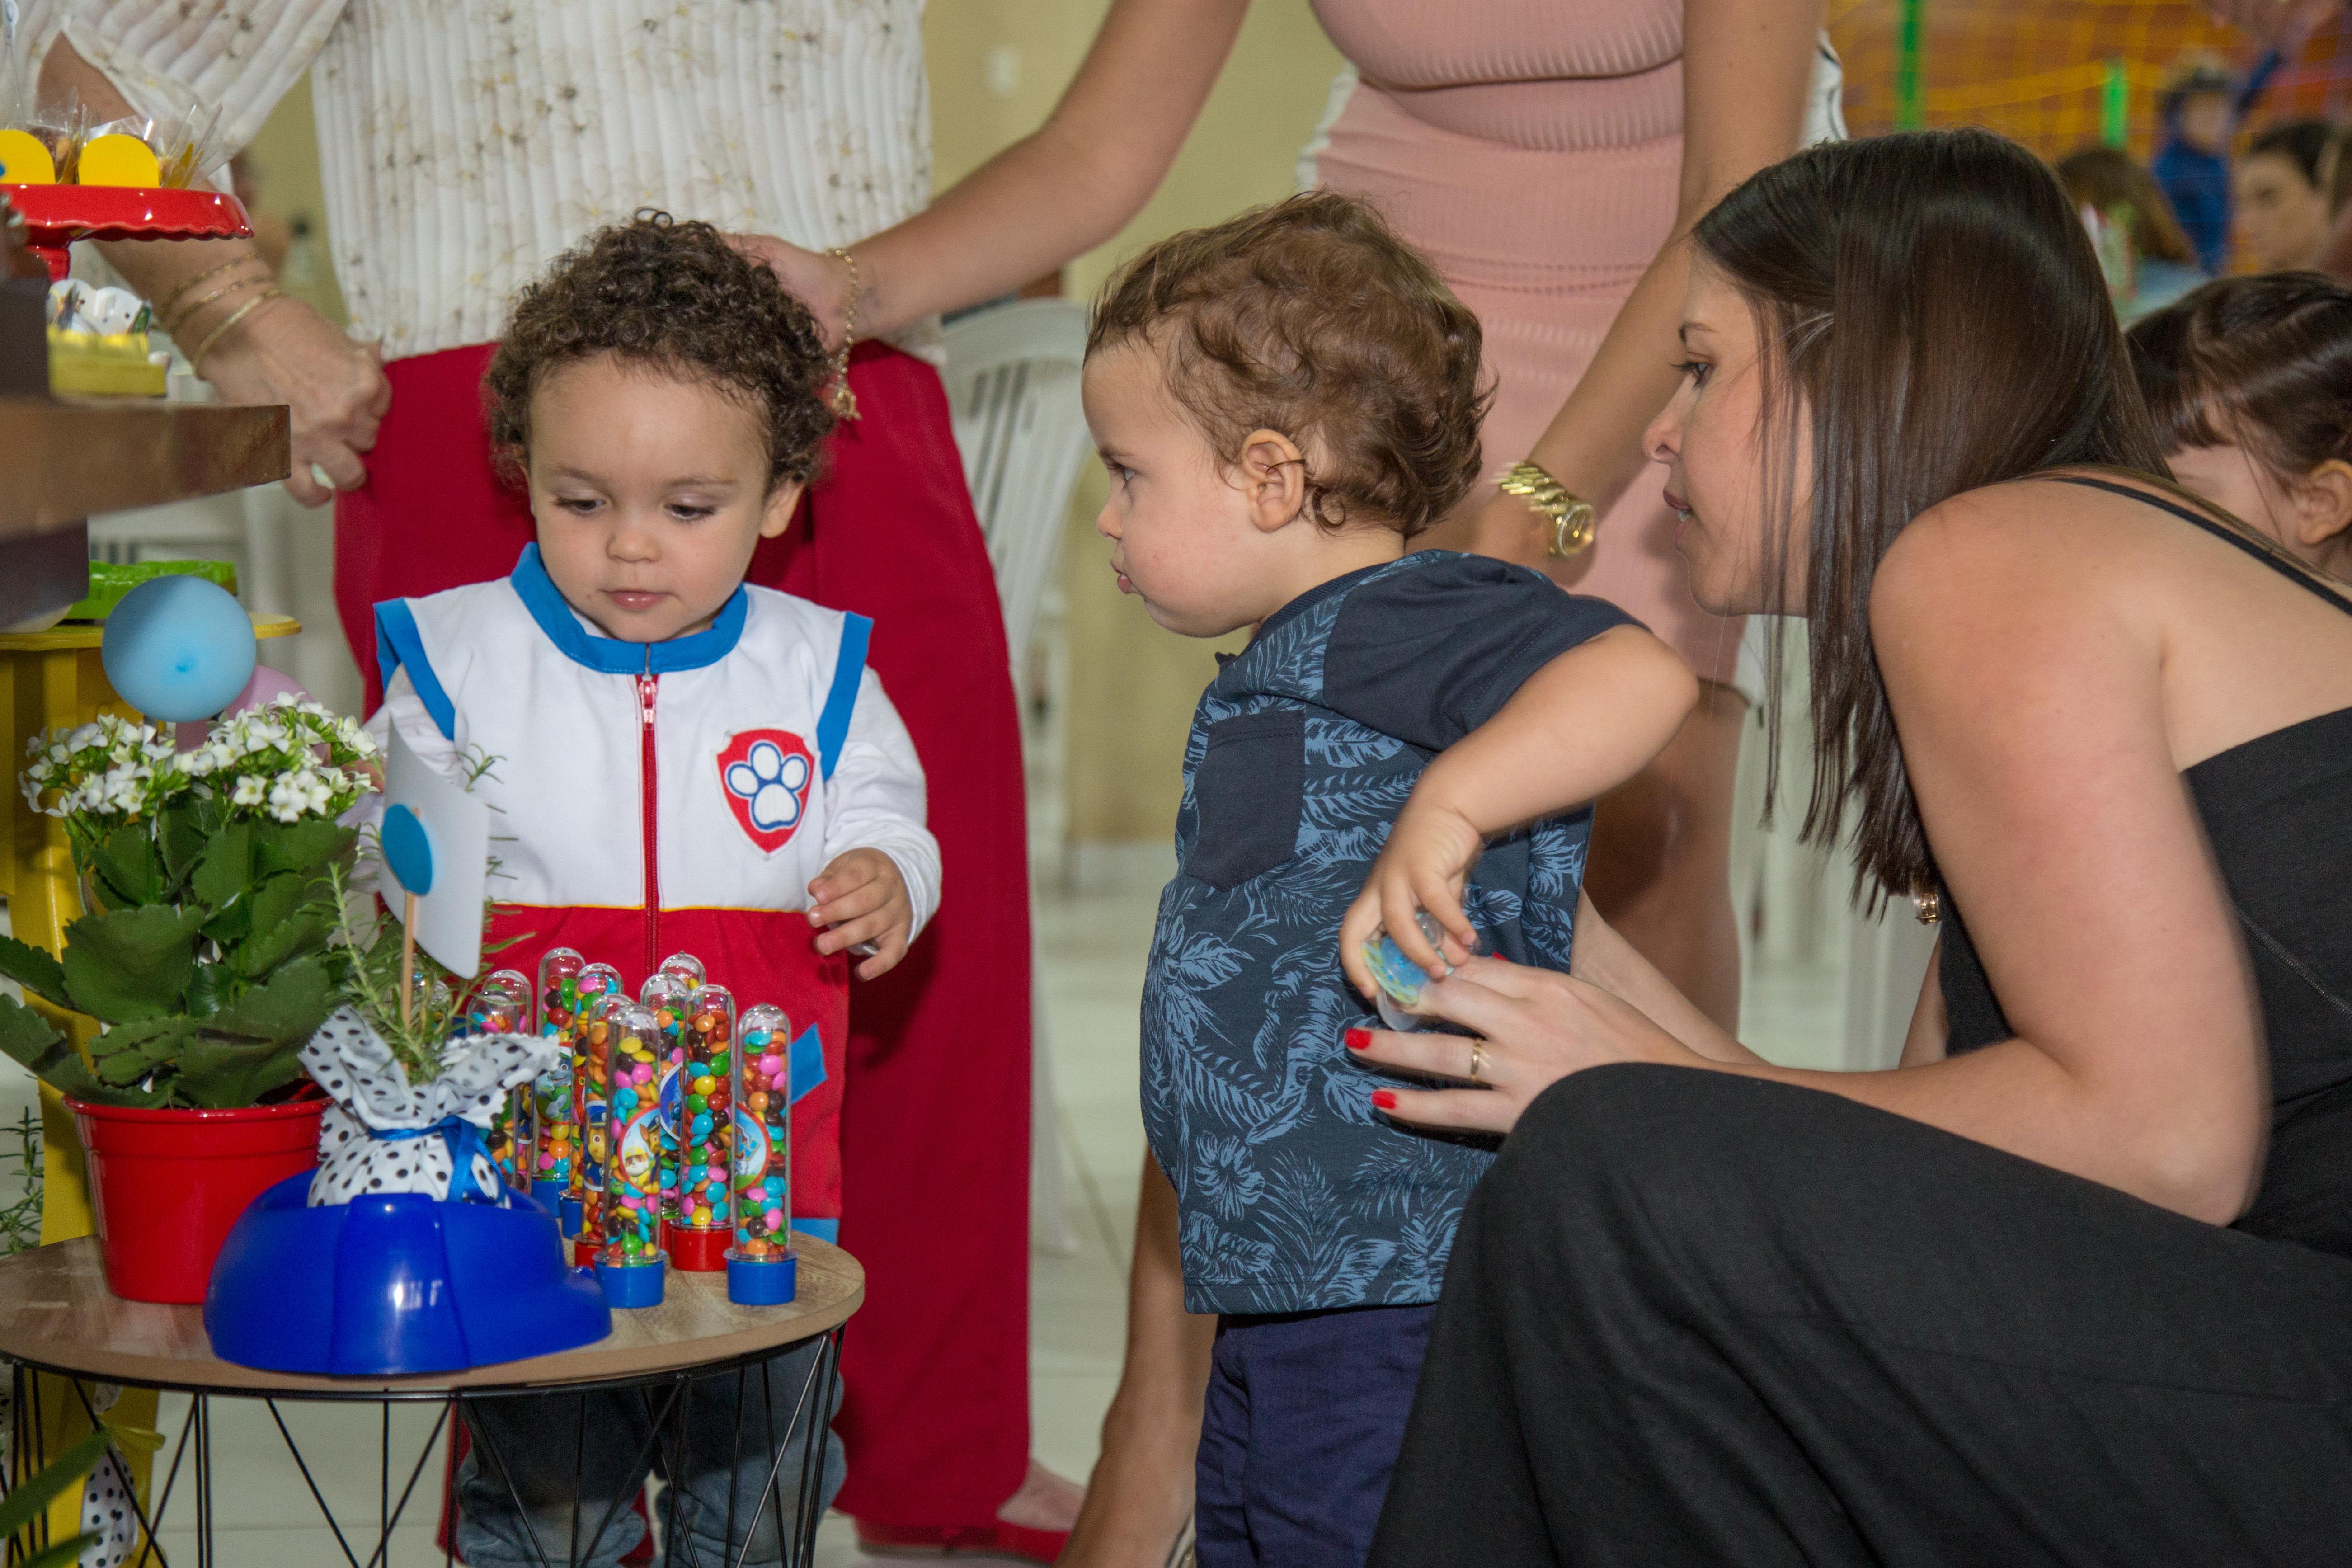 Festa‐Infantil‐Florianopolis‐Ana‐Marmo‐FotografiaFesta‐Infantil‐Florianopolis‐Ana‐Marmo‐Fotografia191A0612